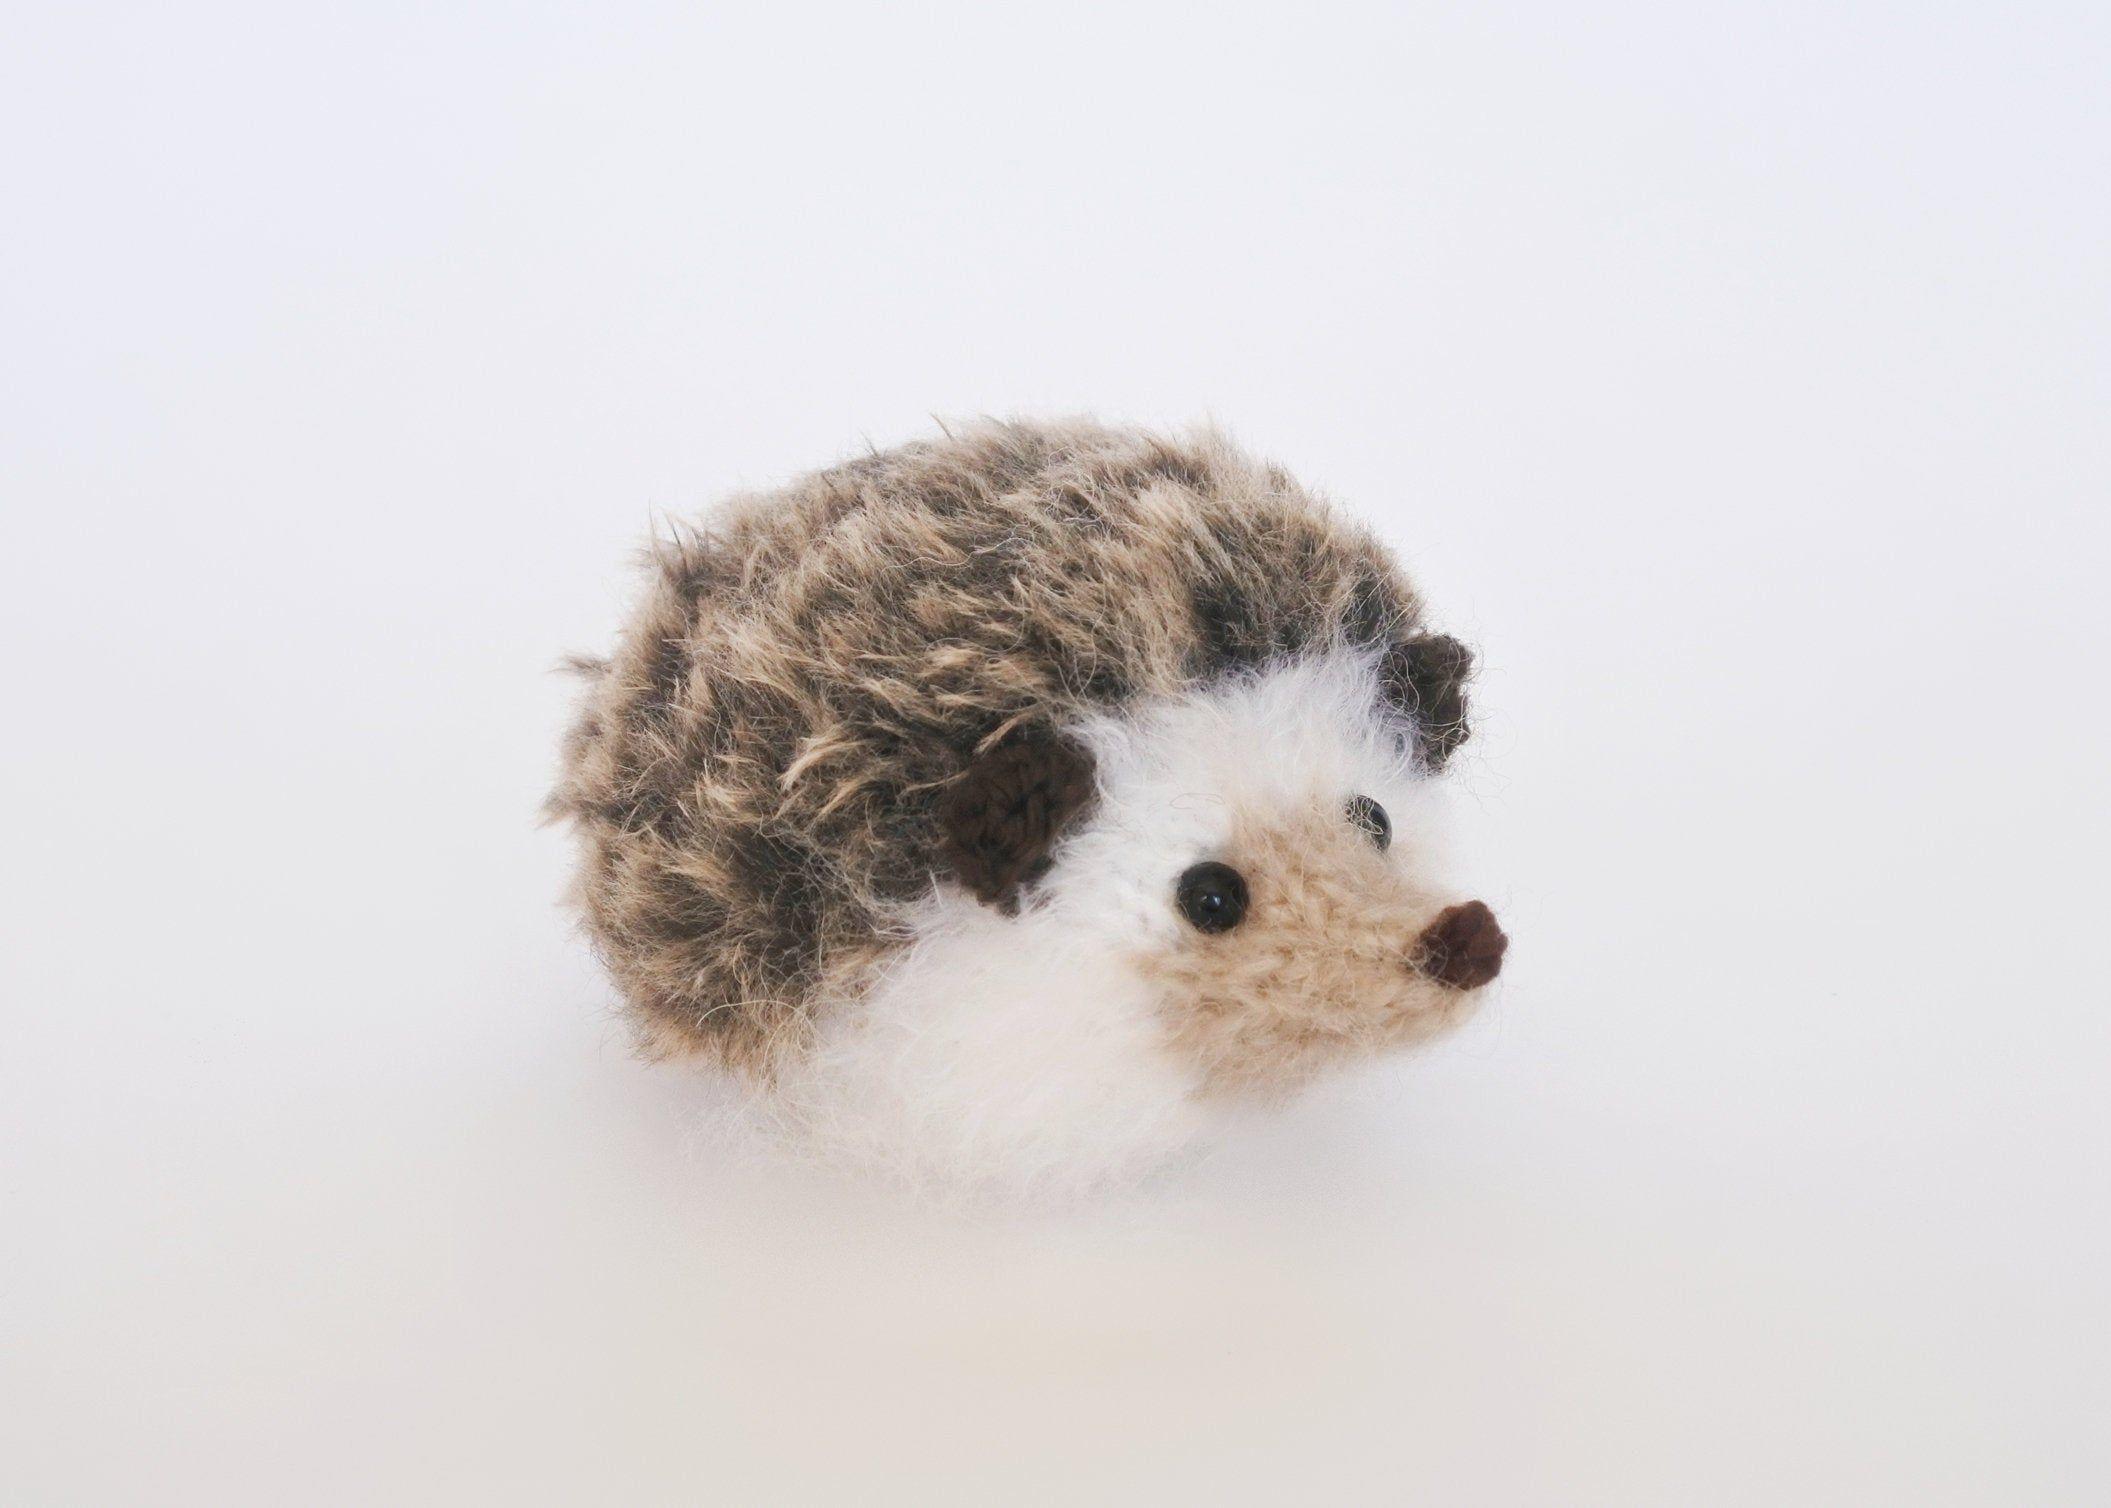 Pastel Rainbow Hedgehog Kawaii Plush Toy Mini Knitted Etsy Knitted Stuffed Animals Kawaii Plush Pet Toys [ 1508 x 2111 Pixel ]